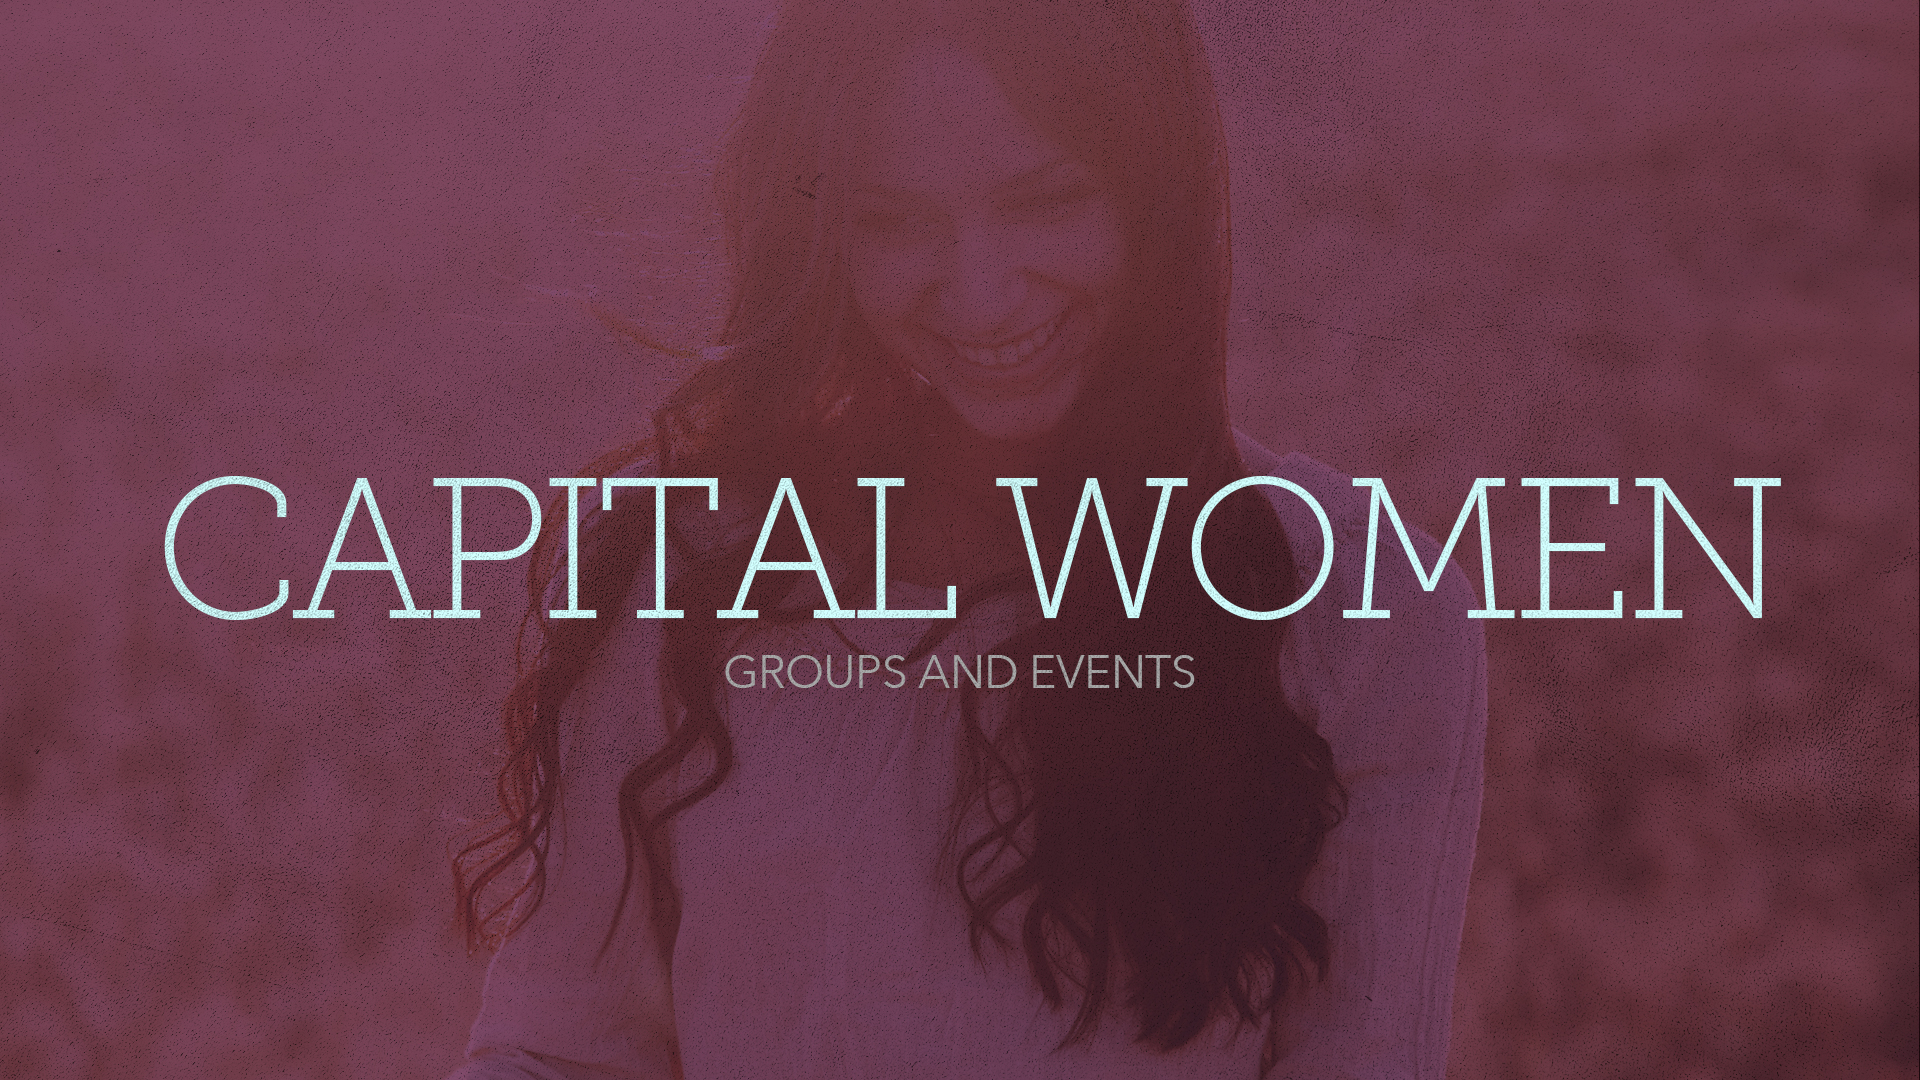 Capital women